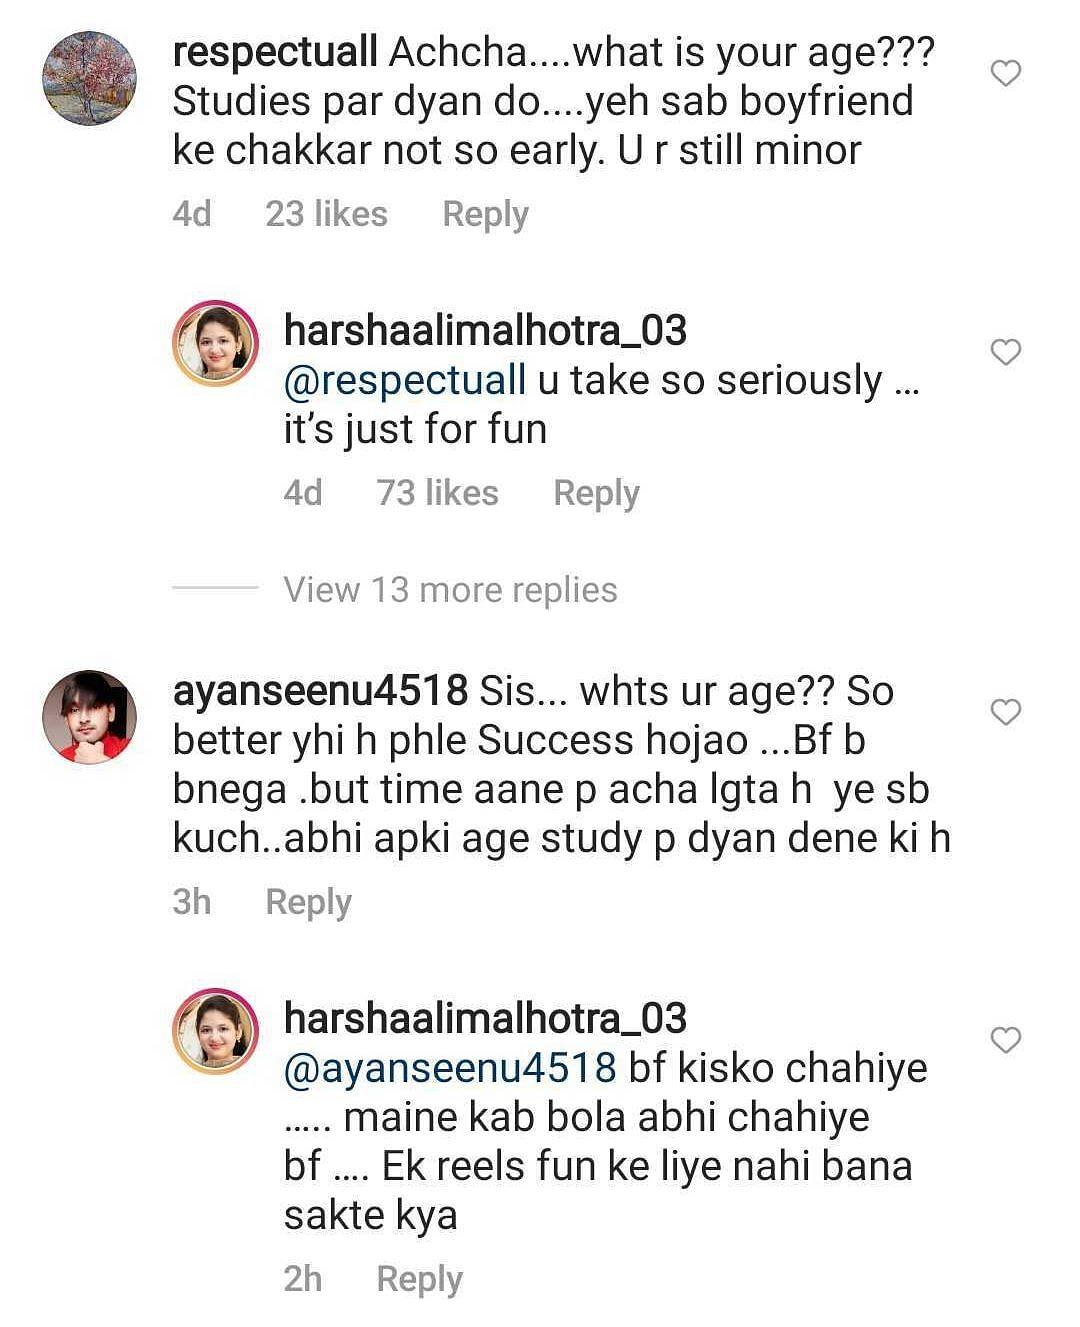 'Boyfriend ke chakkar': Munni from 'Bajrangi Bhaijaan' responds to troll who asked her to focus on studies